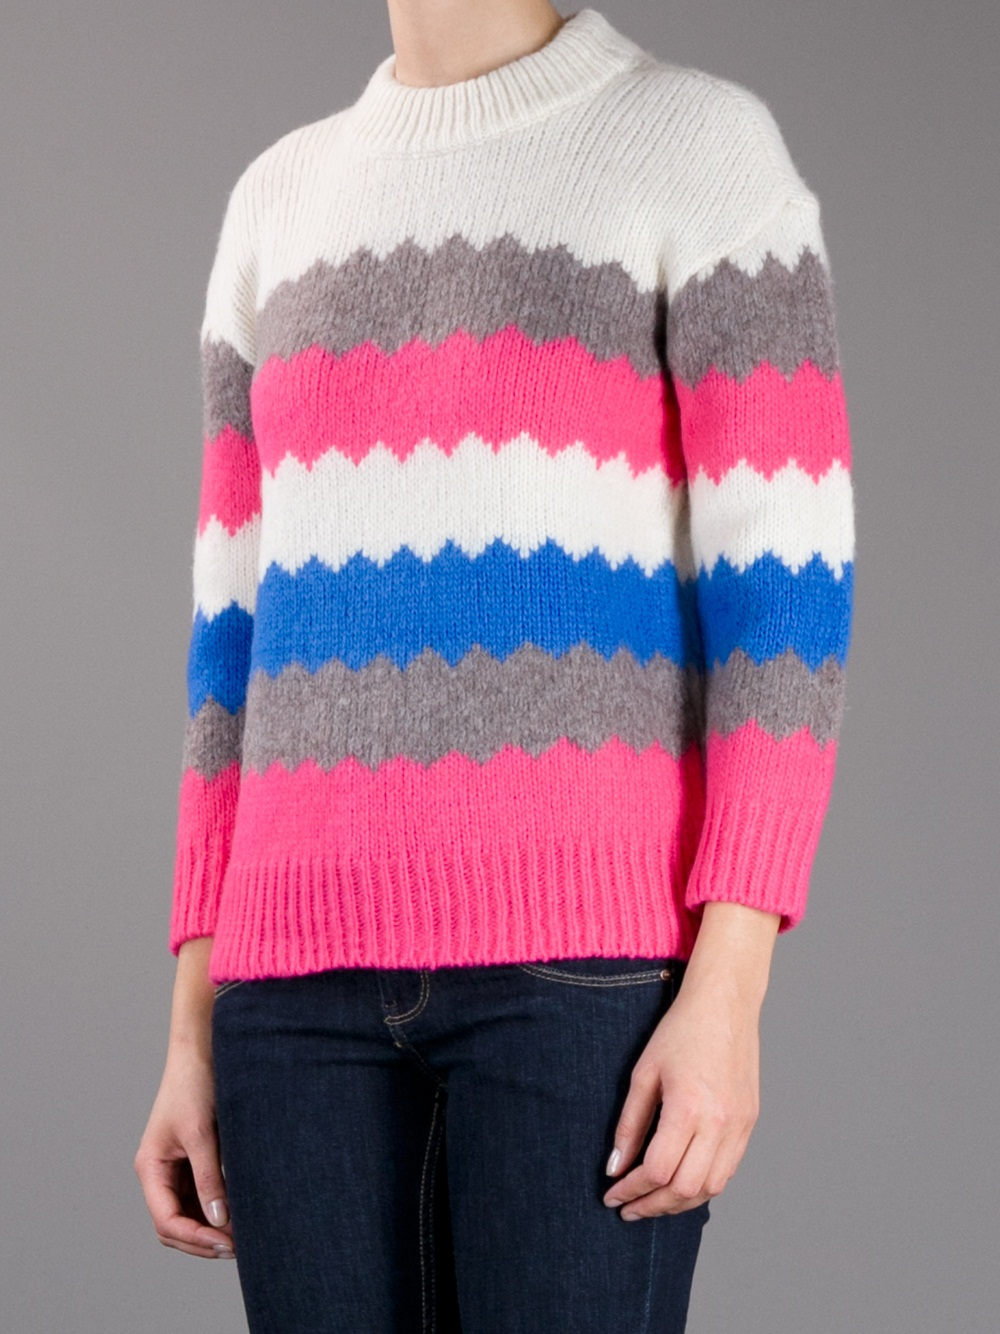 marc by marc jacobs birchmulti woolblend nikolai pullover in pink lyst. Black Bedroom Furniture Sets. Home Design Ideas